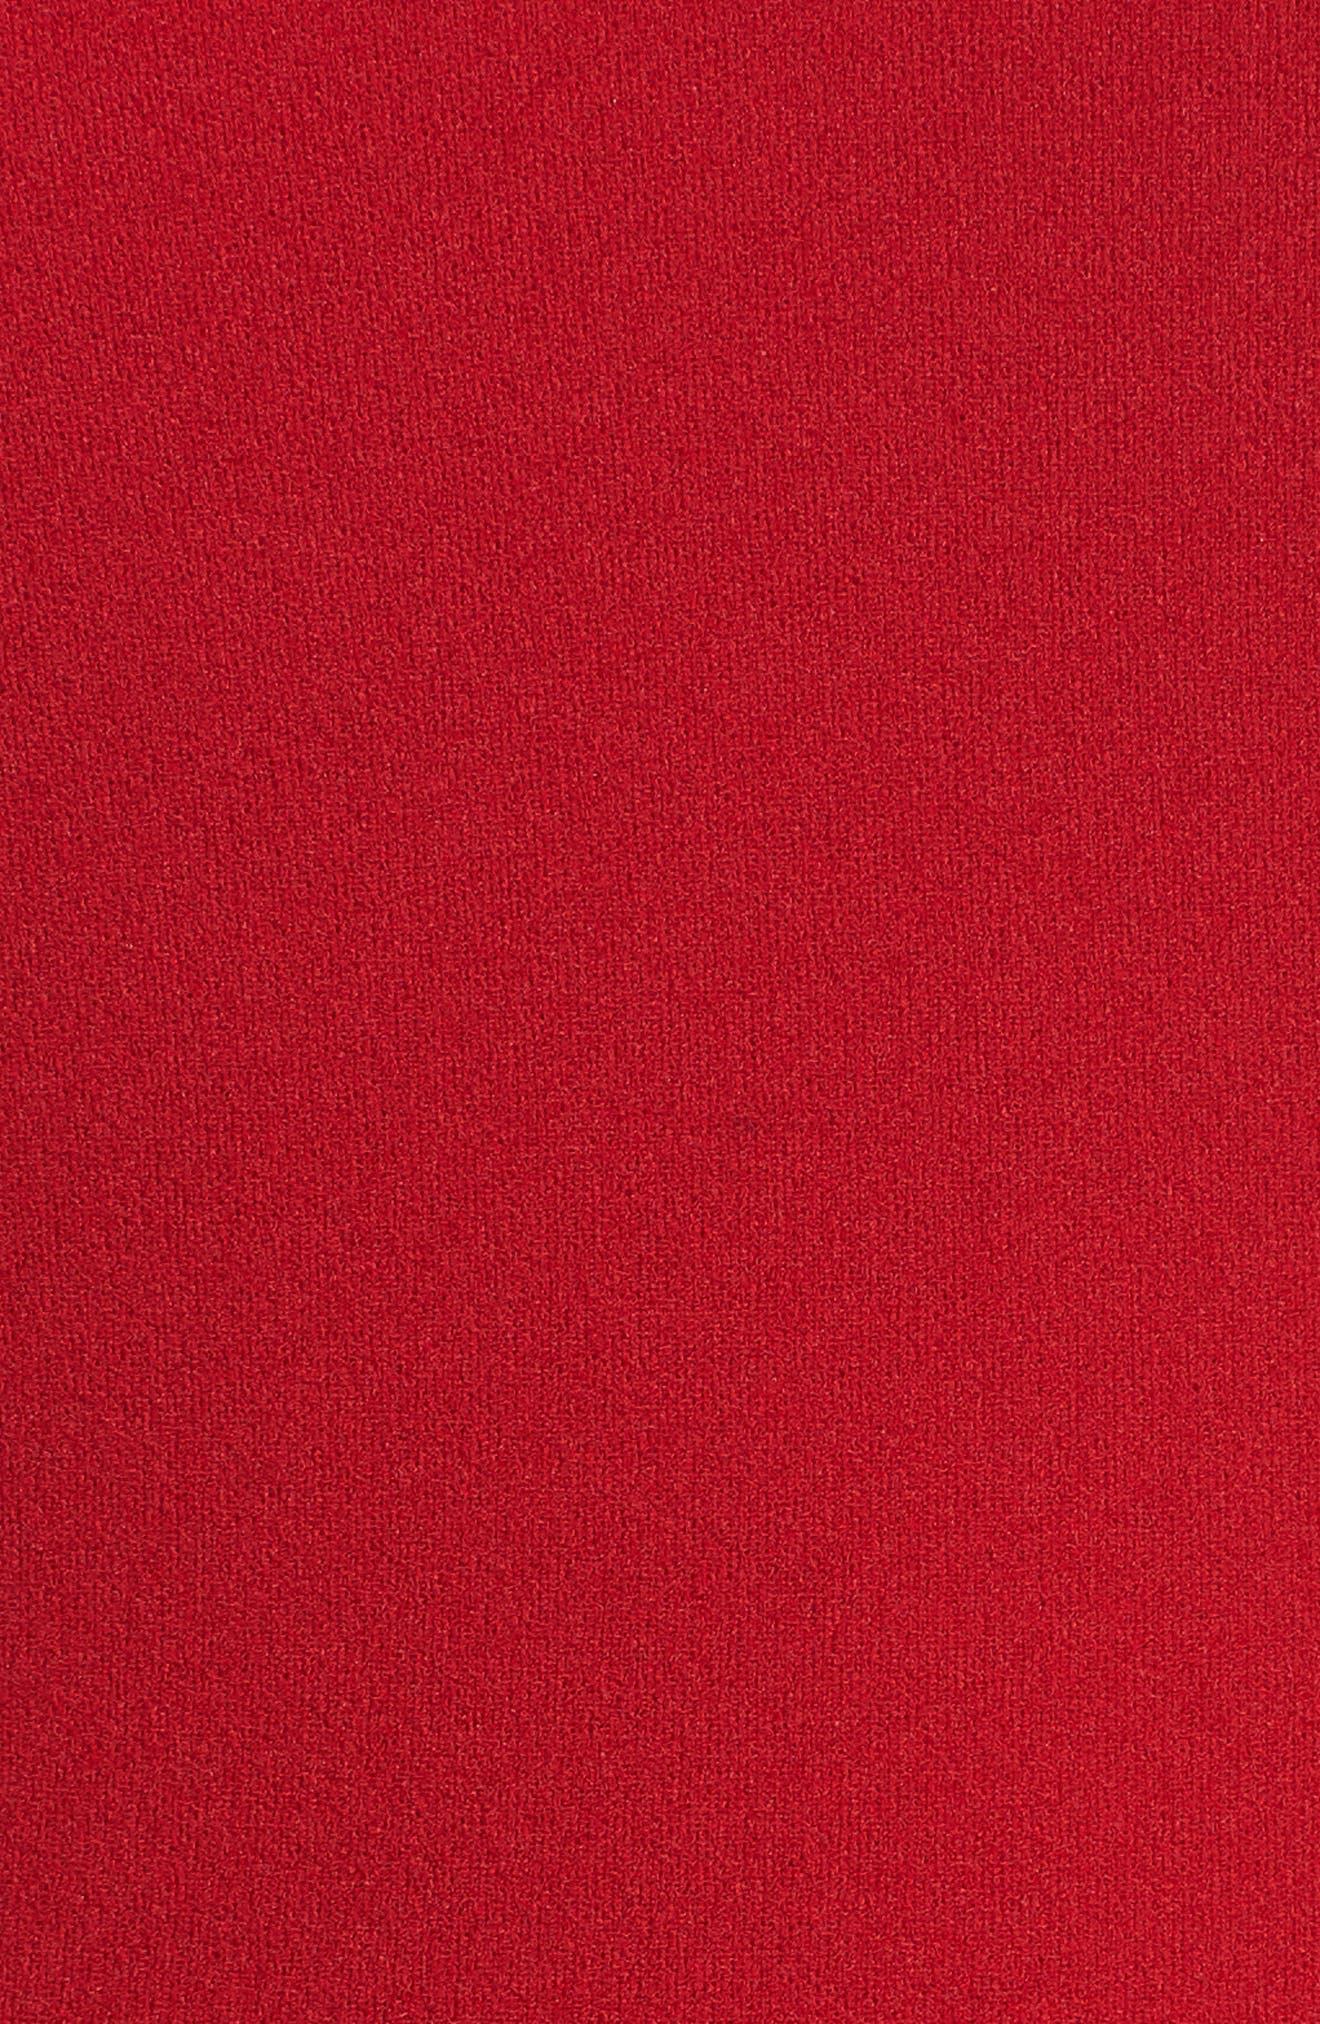 Sheath Dress,                             Alternate thumbnail 5, color,                             600